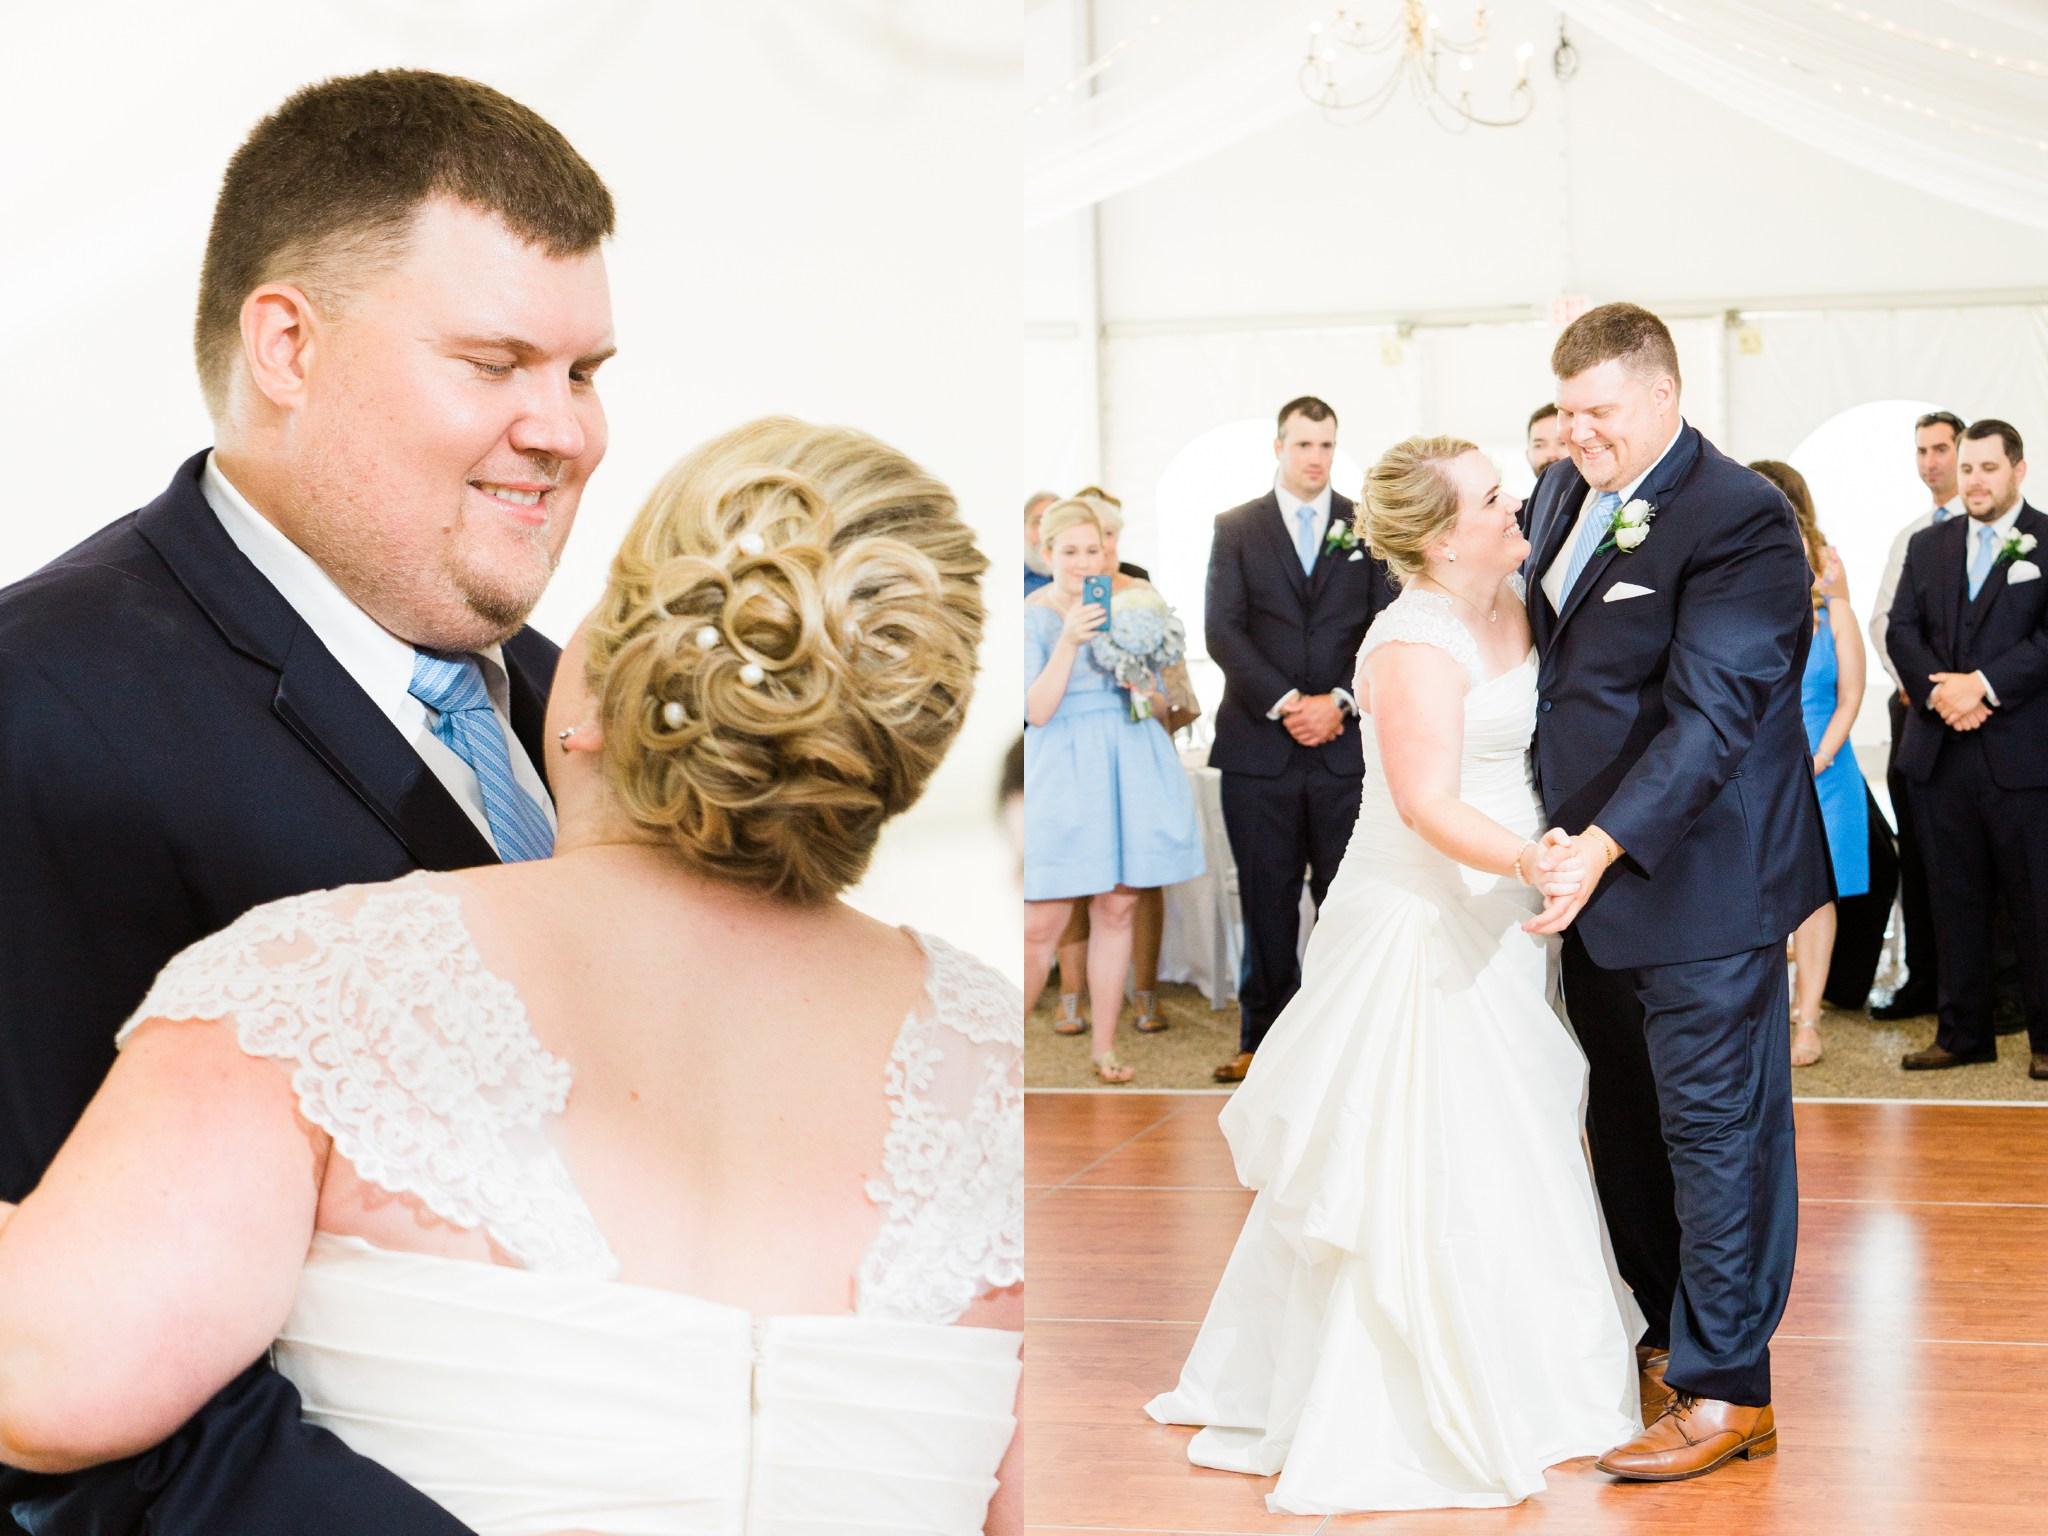 misselwood_endicott_college_wedding_photos_00067.JPG